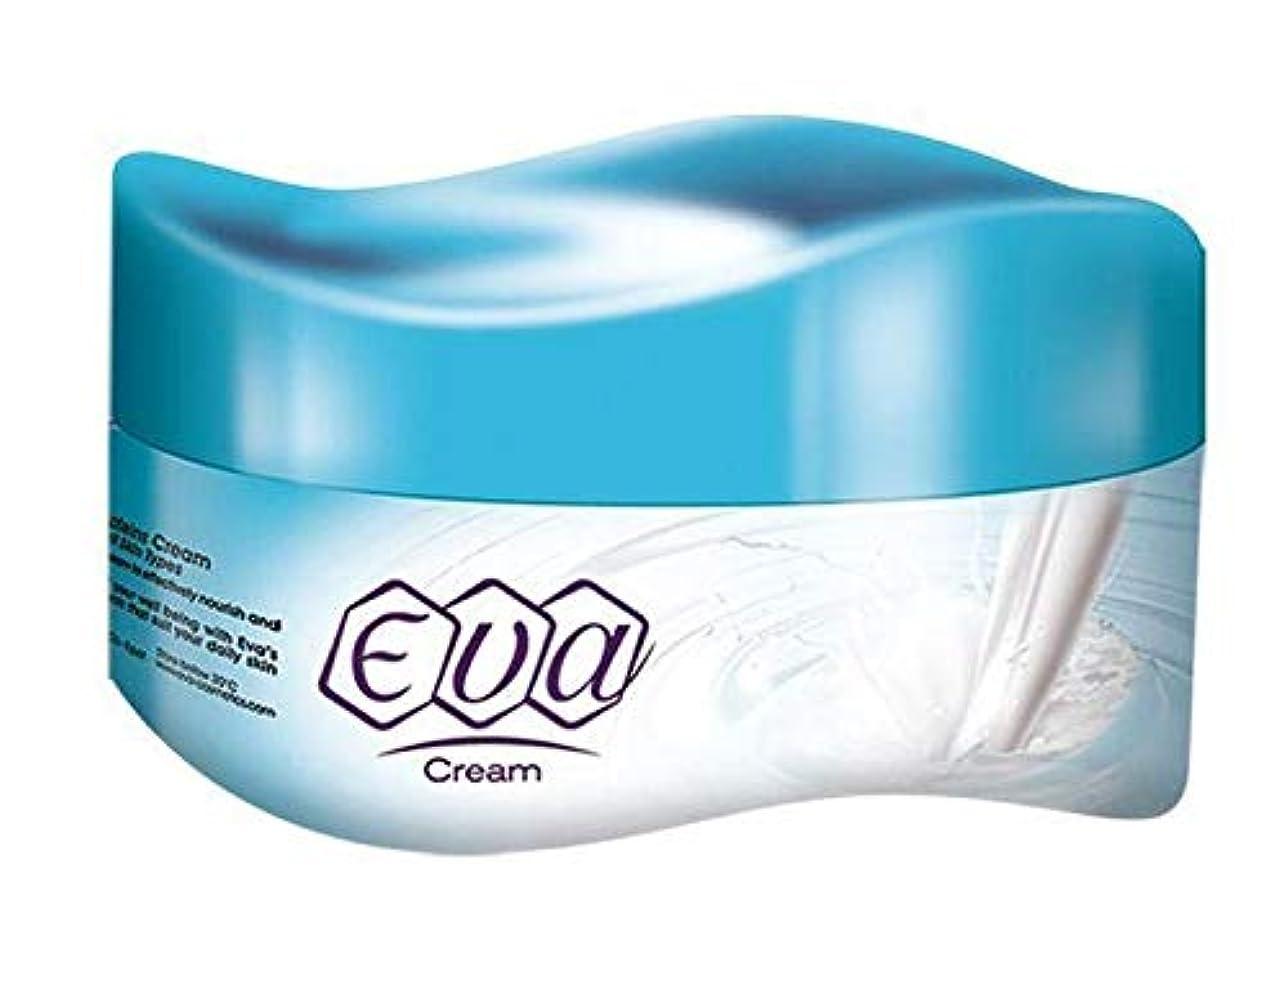 Eva Skin Care Cream Face Moisturizers Hands Feet Elbow Body Softening With Glycerin, Honey, Yogurt, Cucumber &...